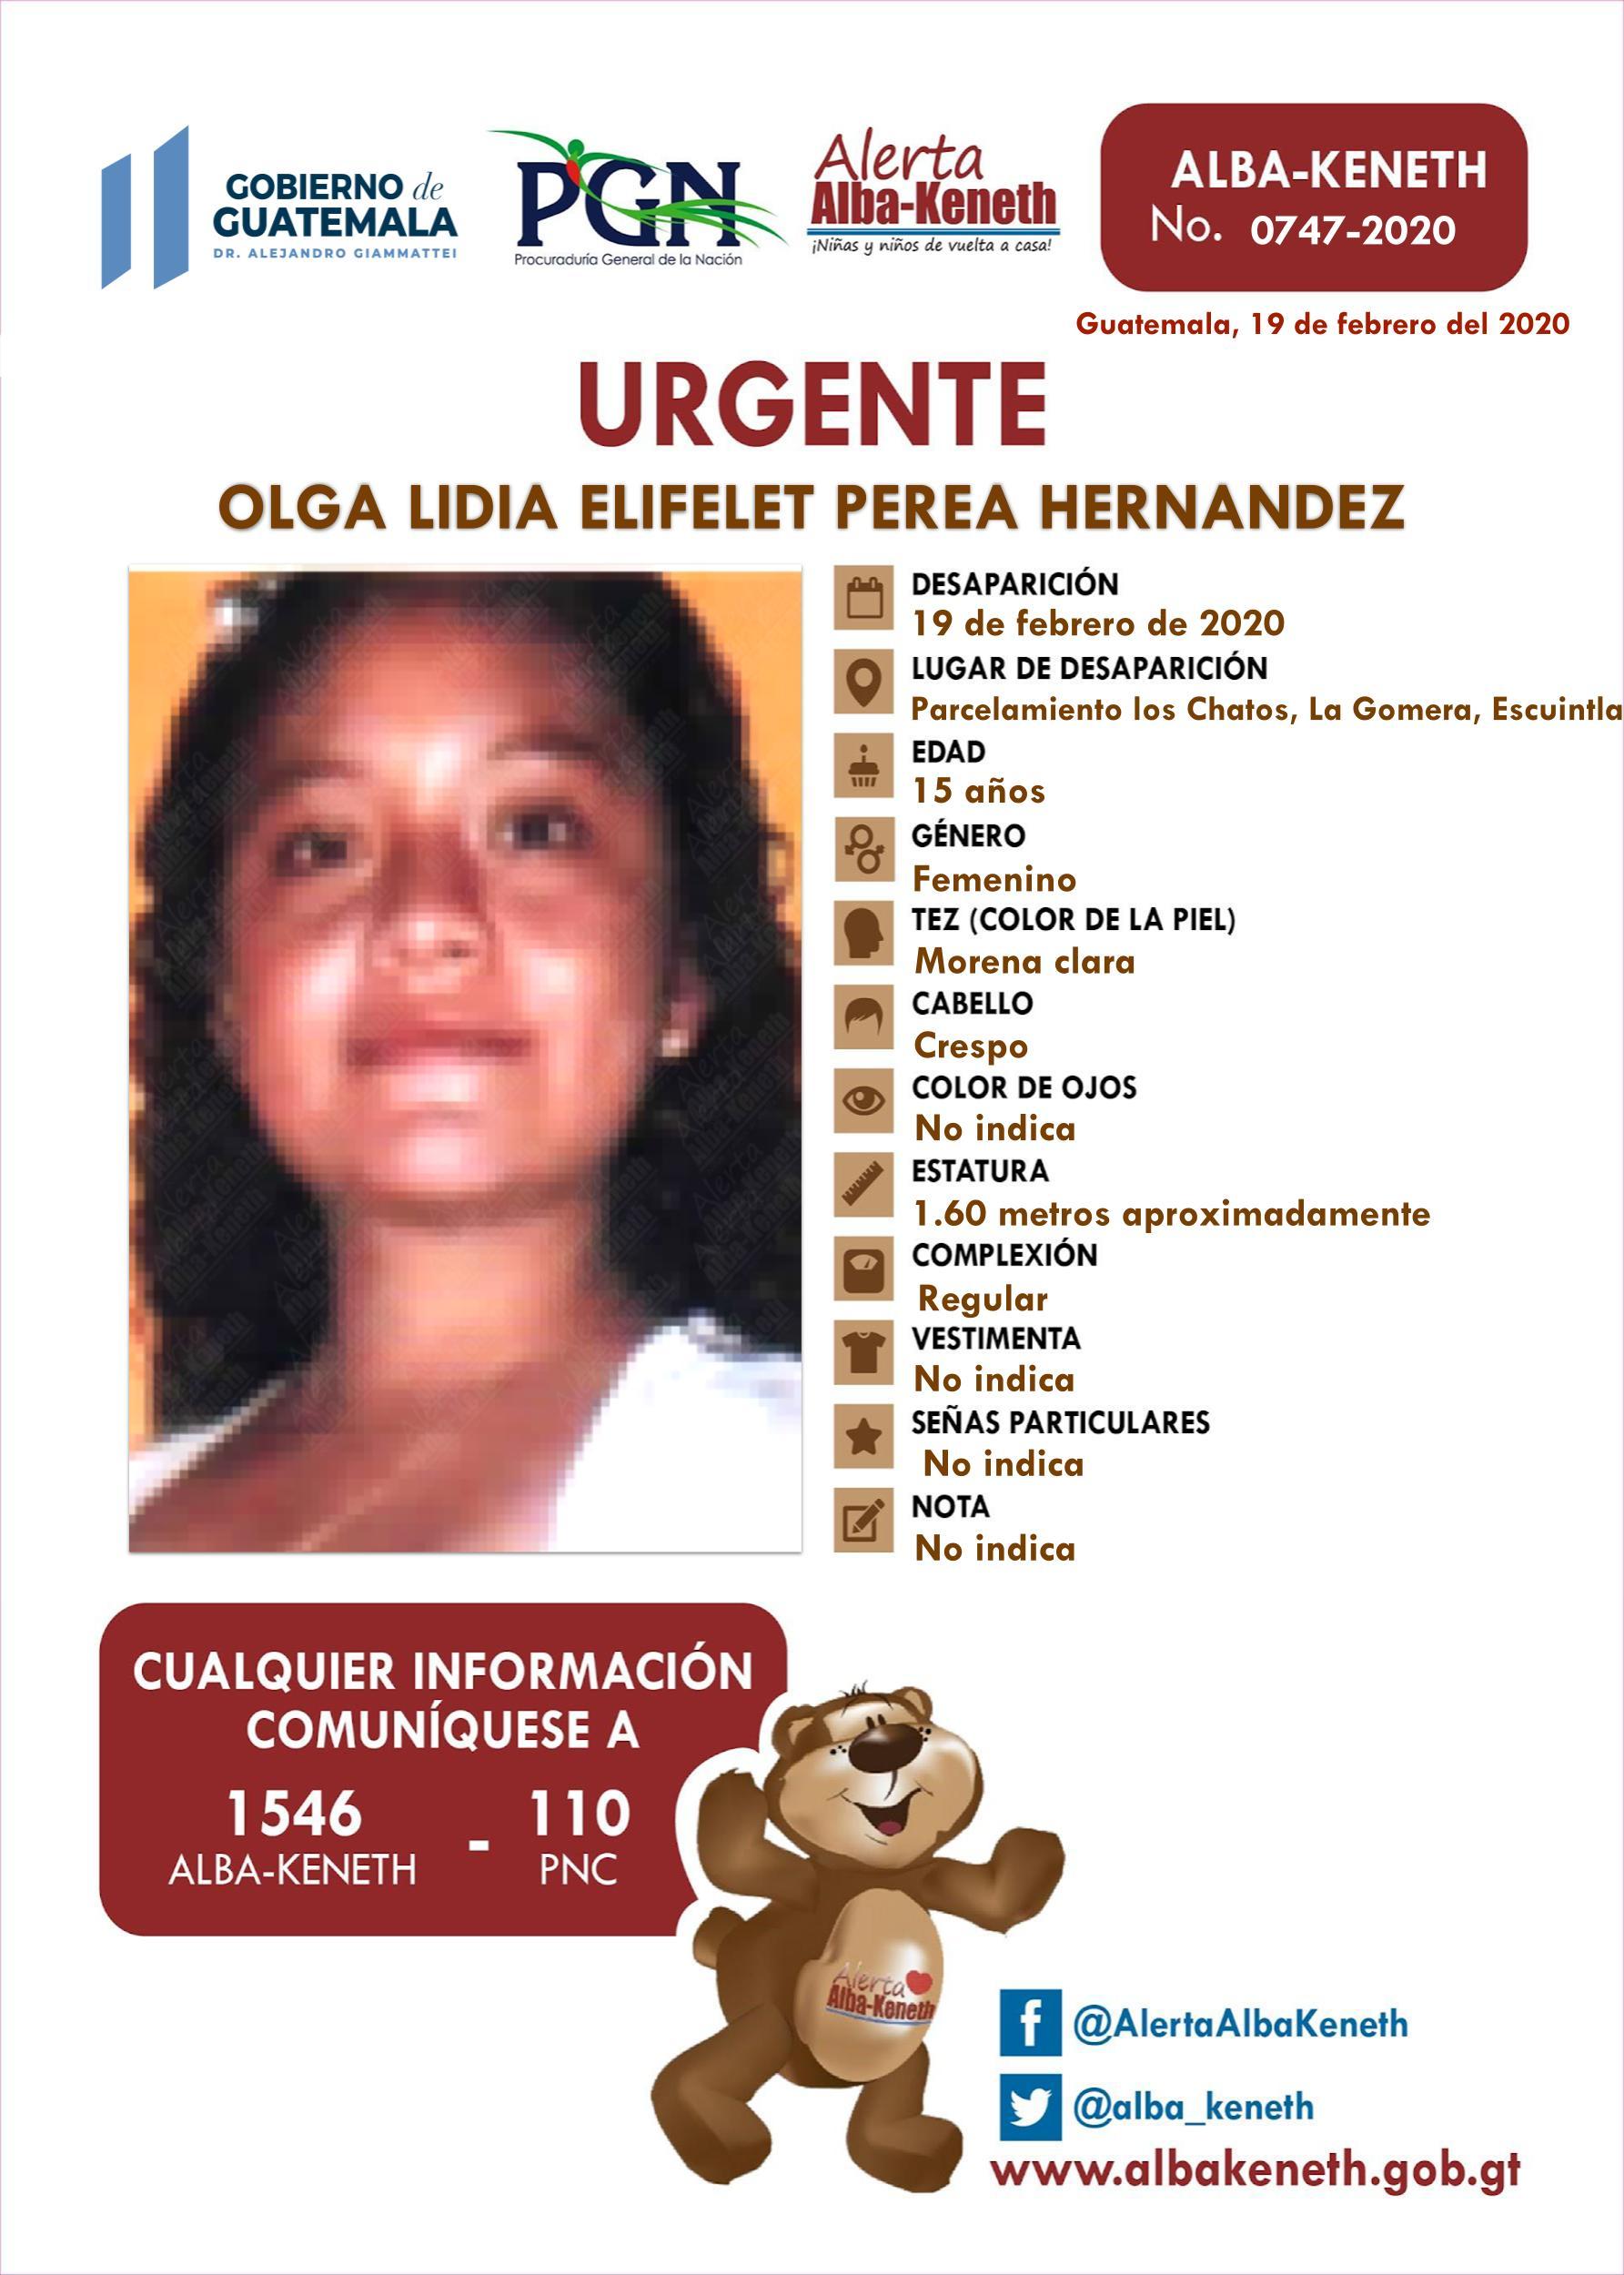 Olga Lidia Elifelet Perea Hernandez